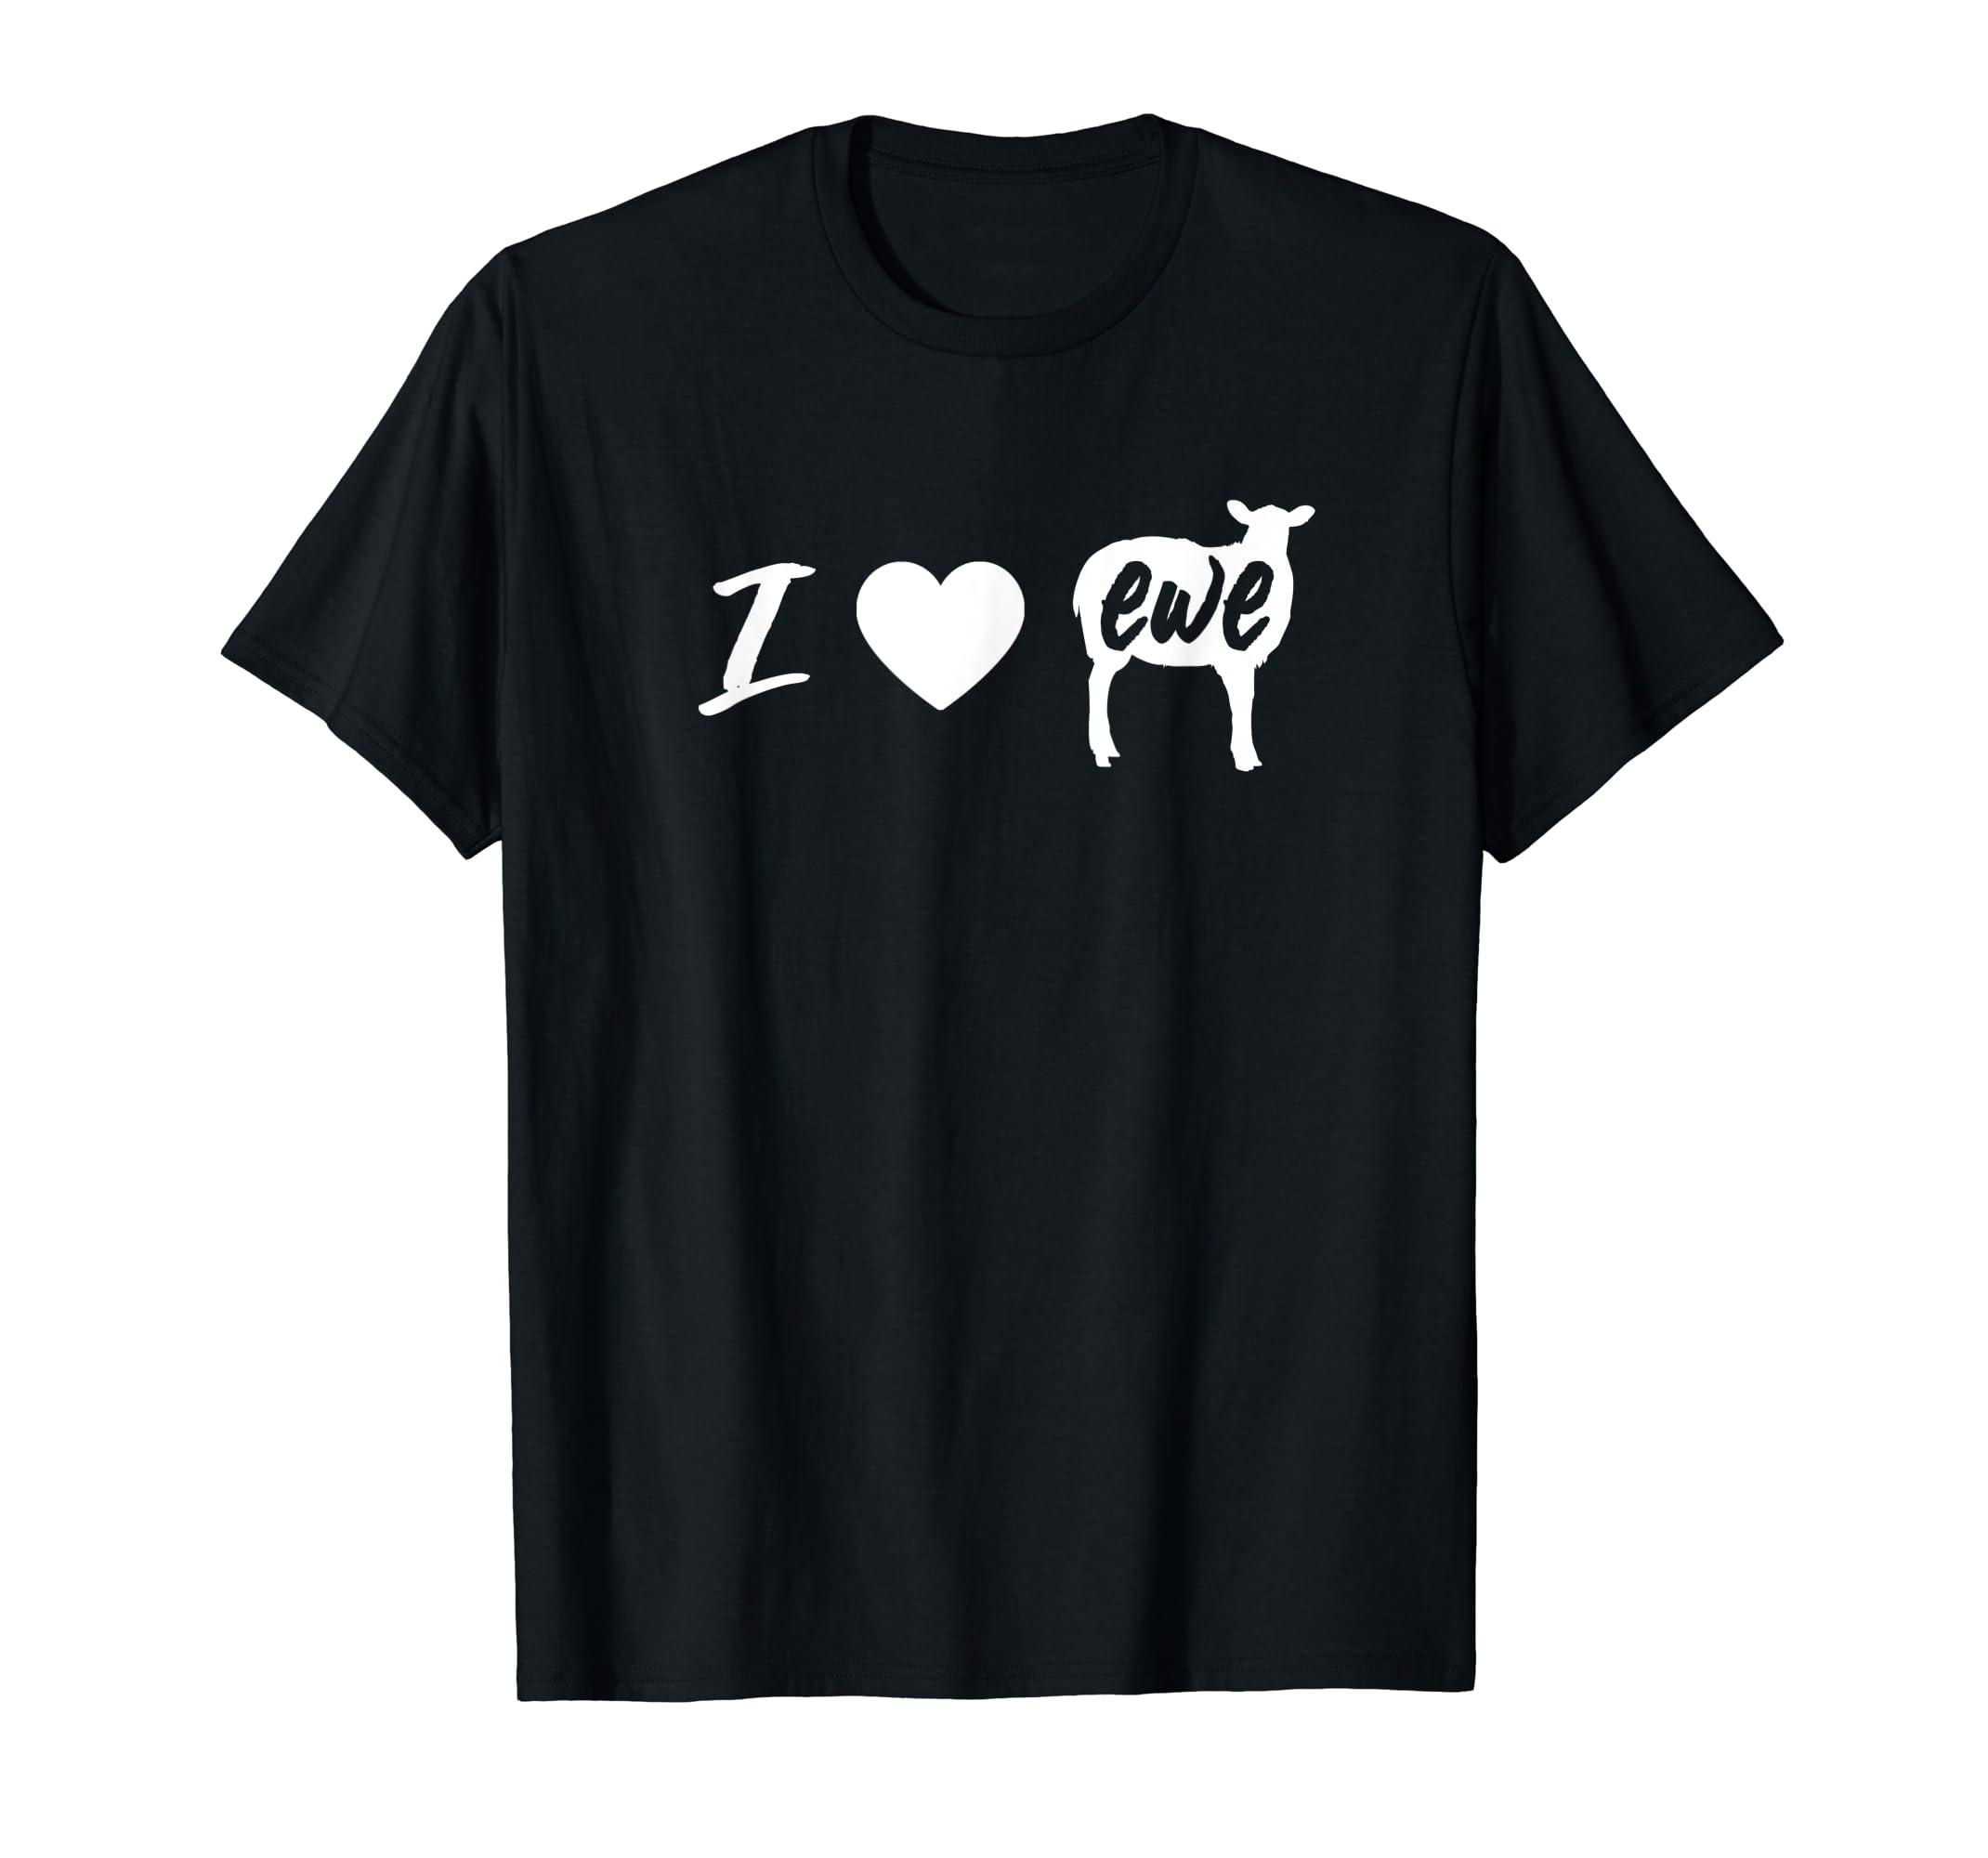 I Love Ewe - I Love You Sheep Pun Shirt-Men's T-Shirt-Black